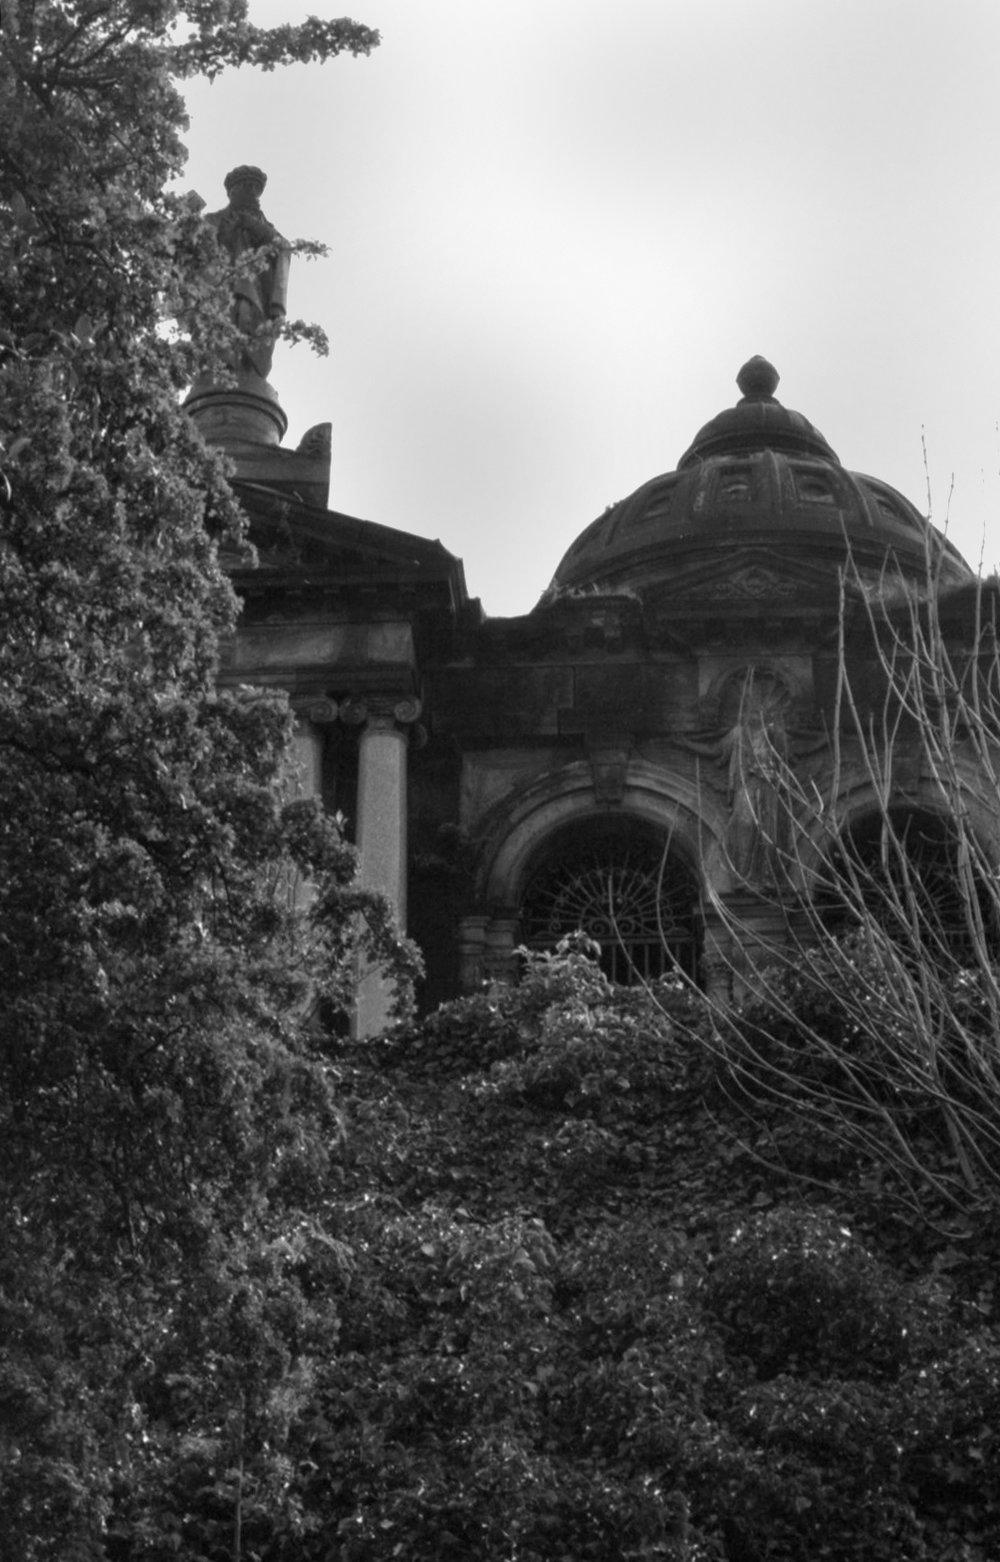 2015_Glasgow_35mm_023.jpg